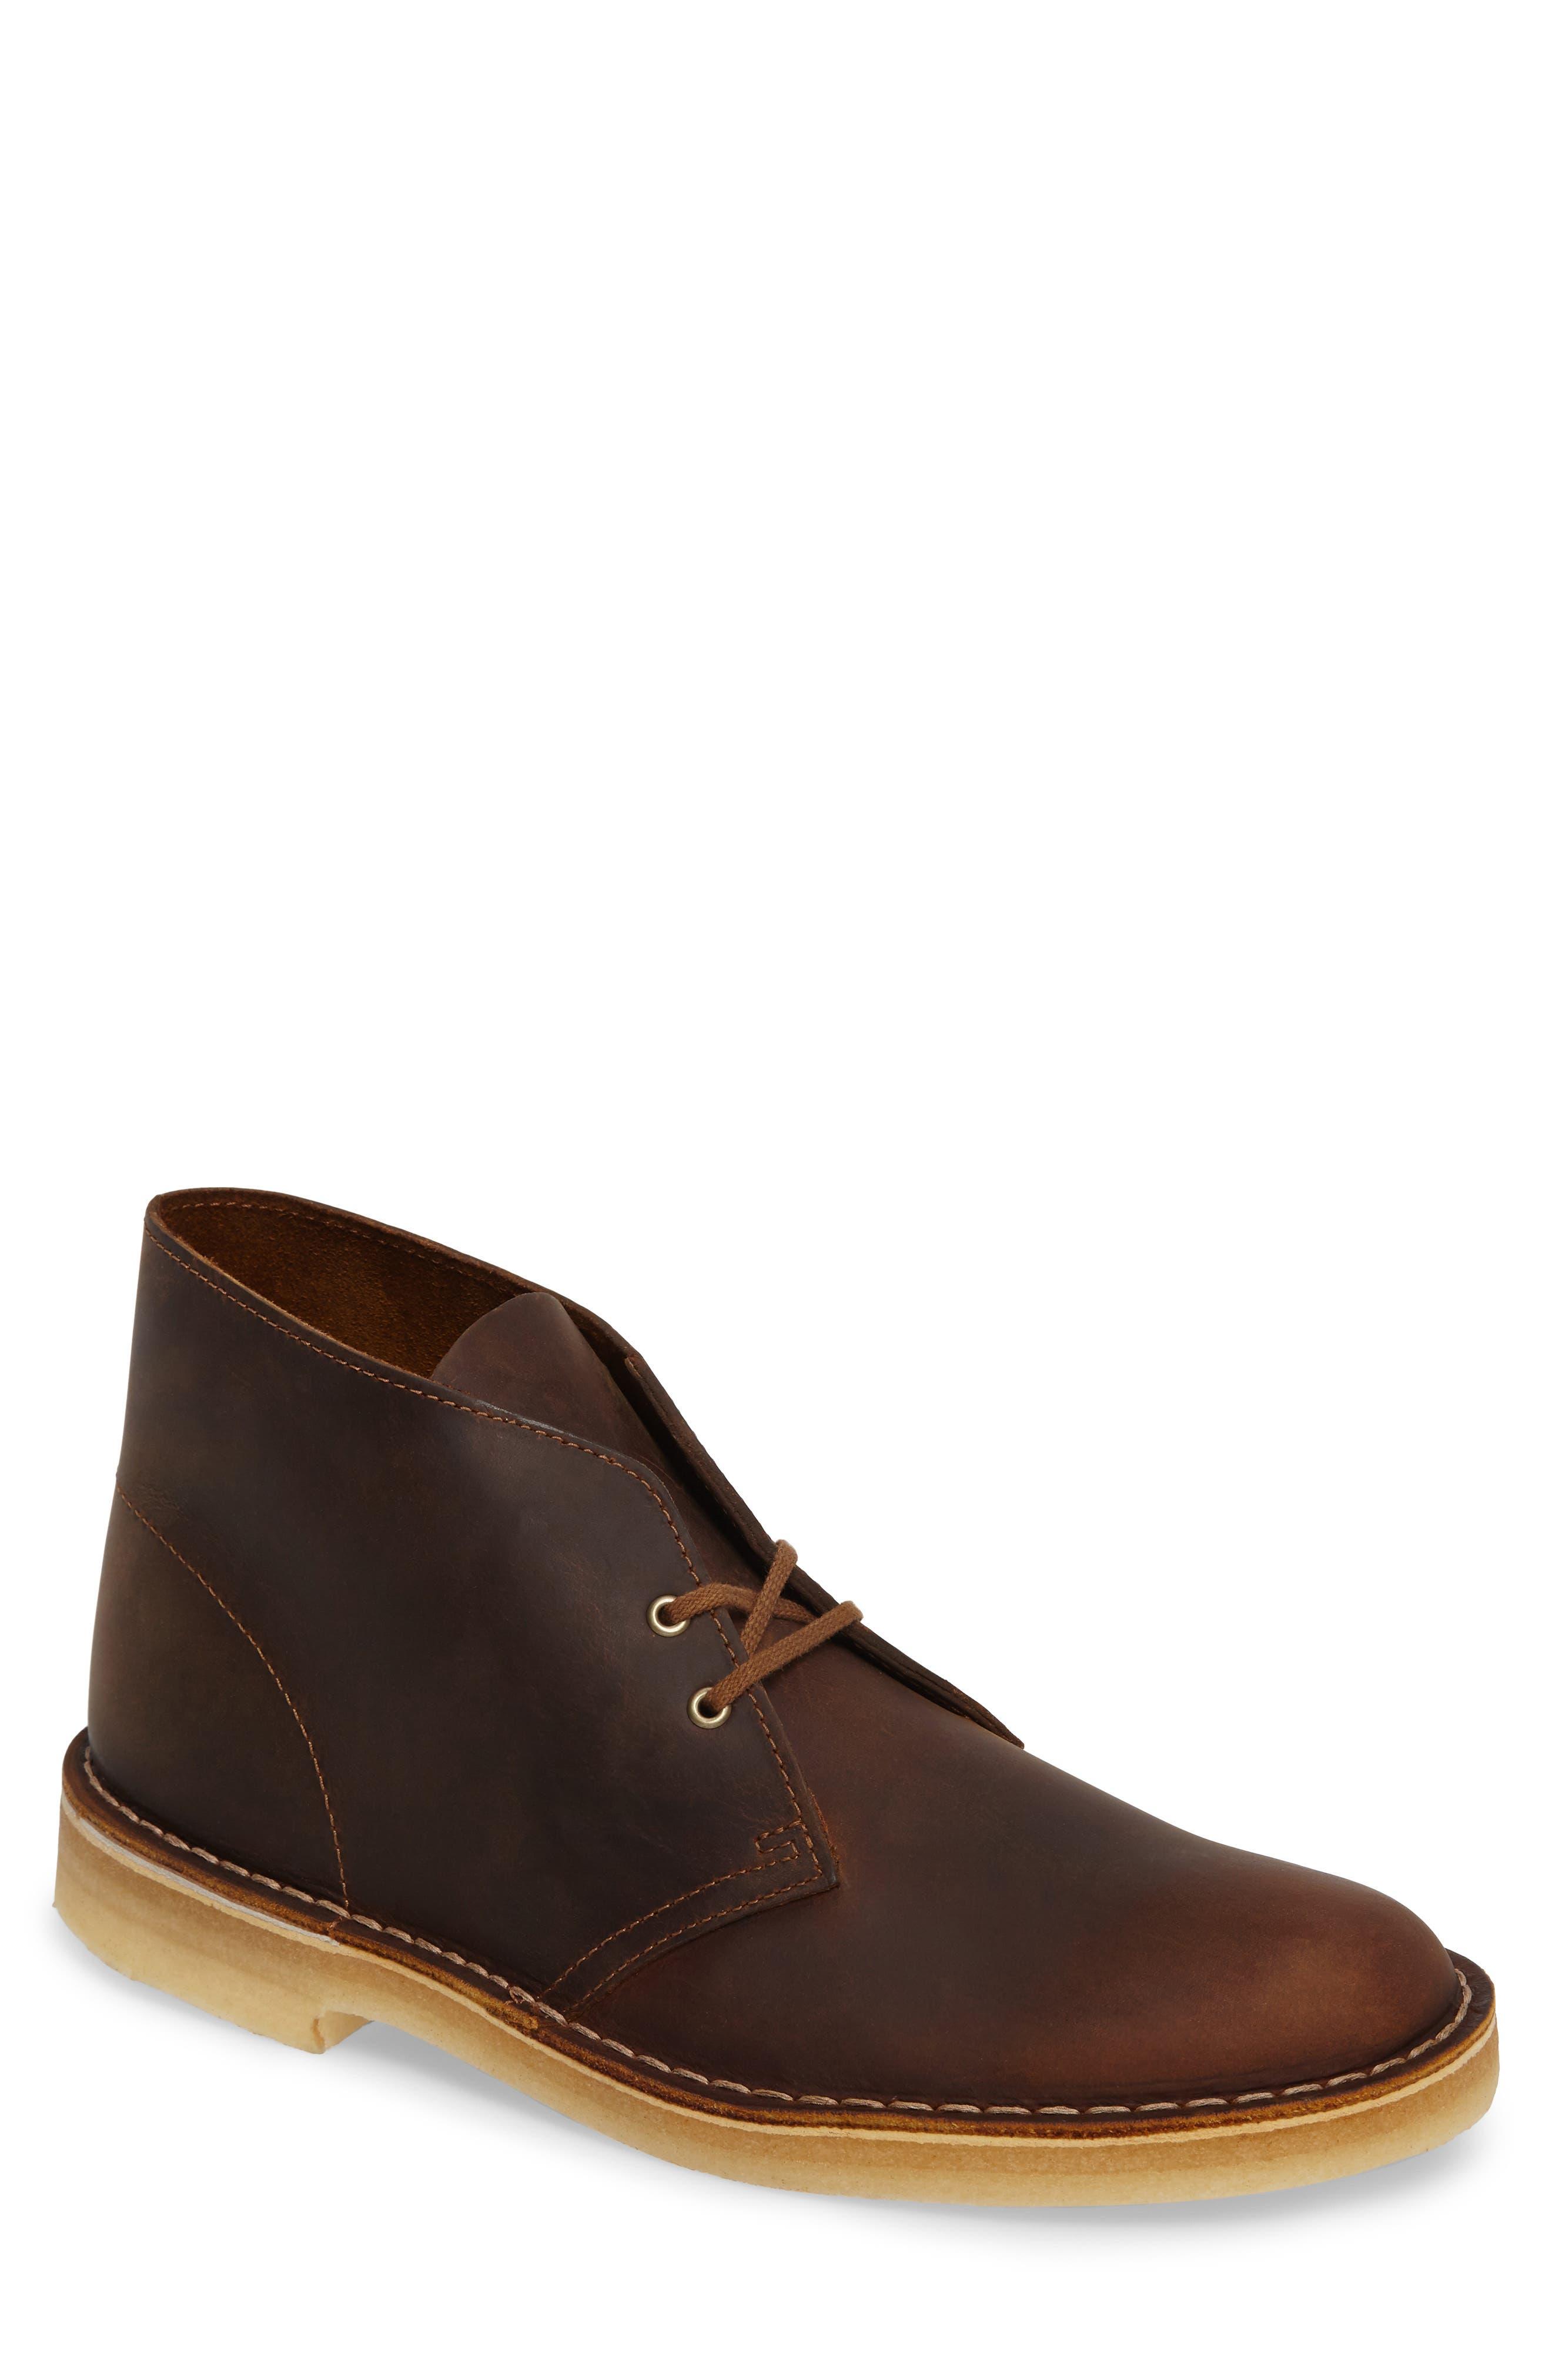 Alternate Image 1 Selected - Clarks® Originals 'Desert' Boot (Men)